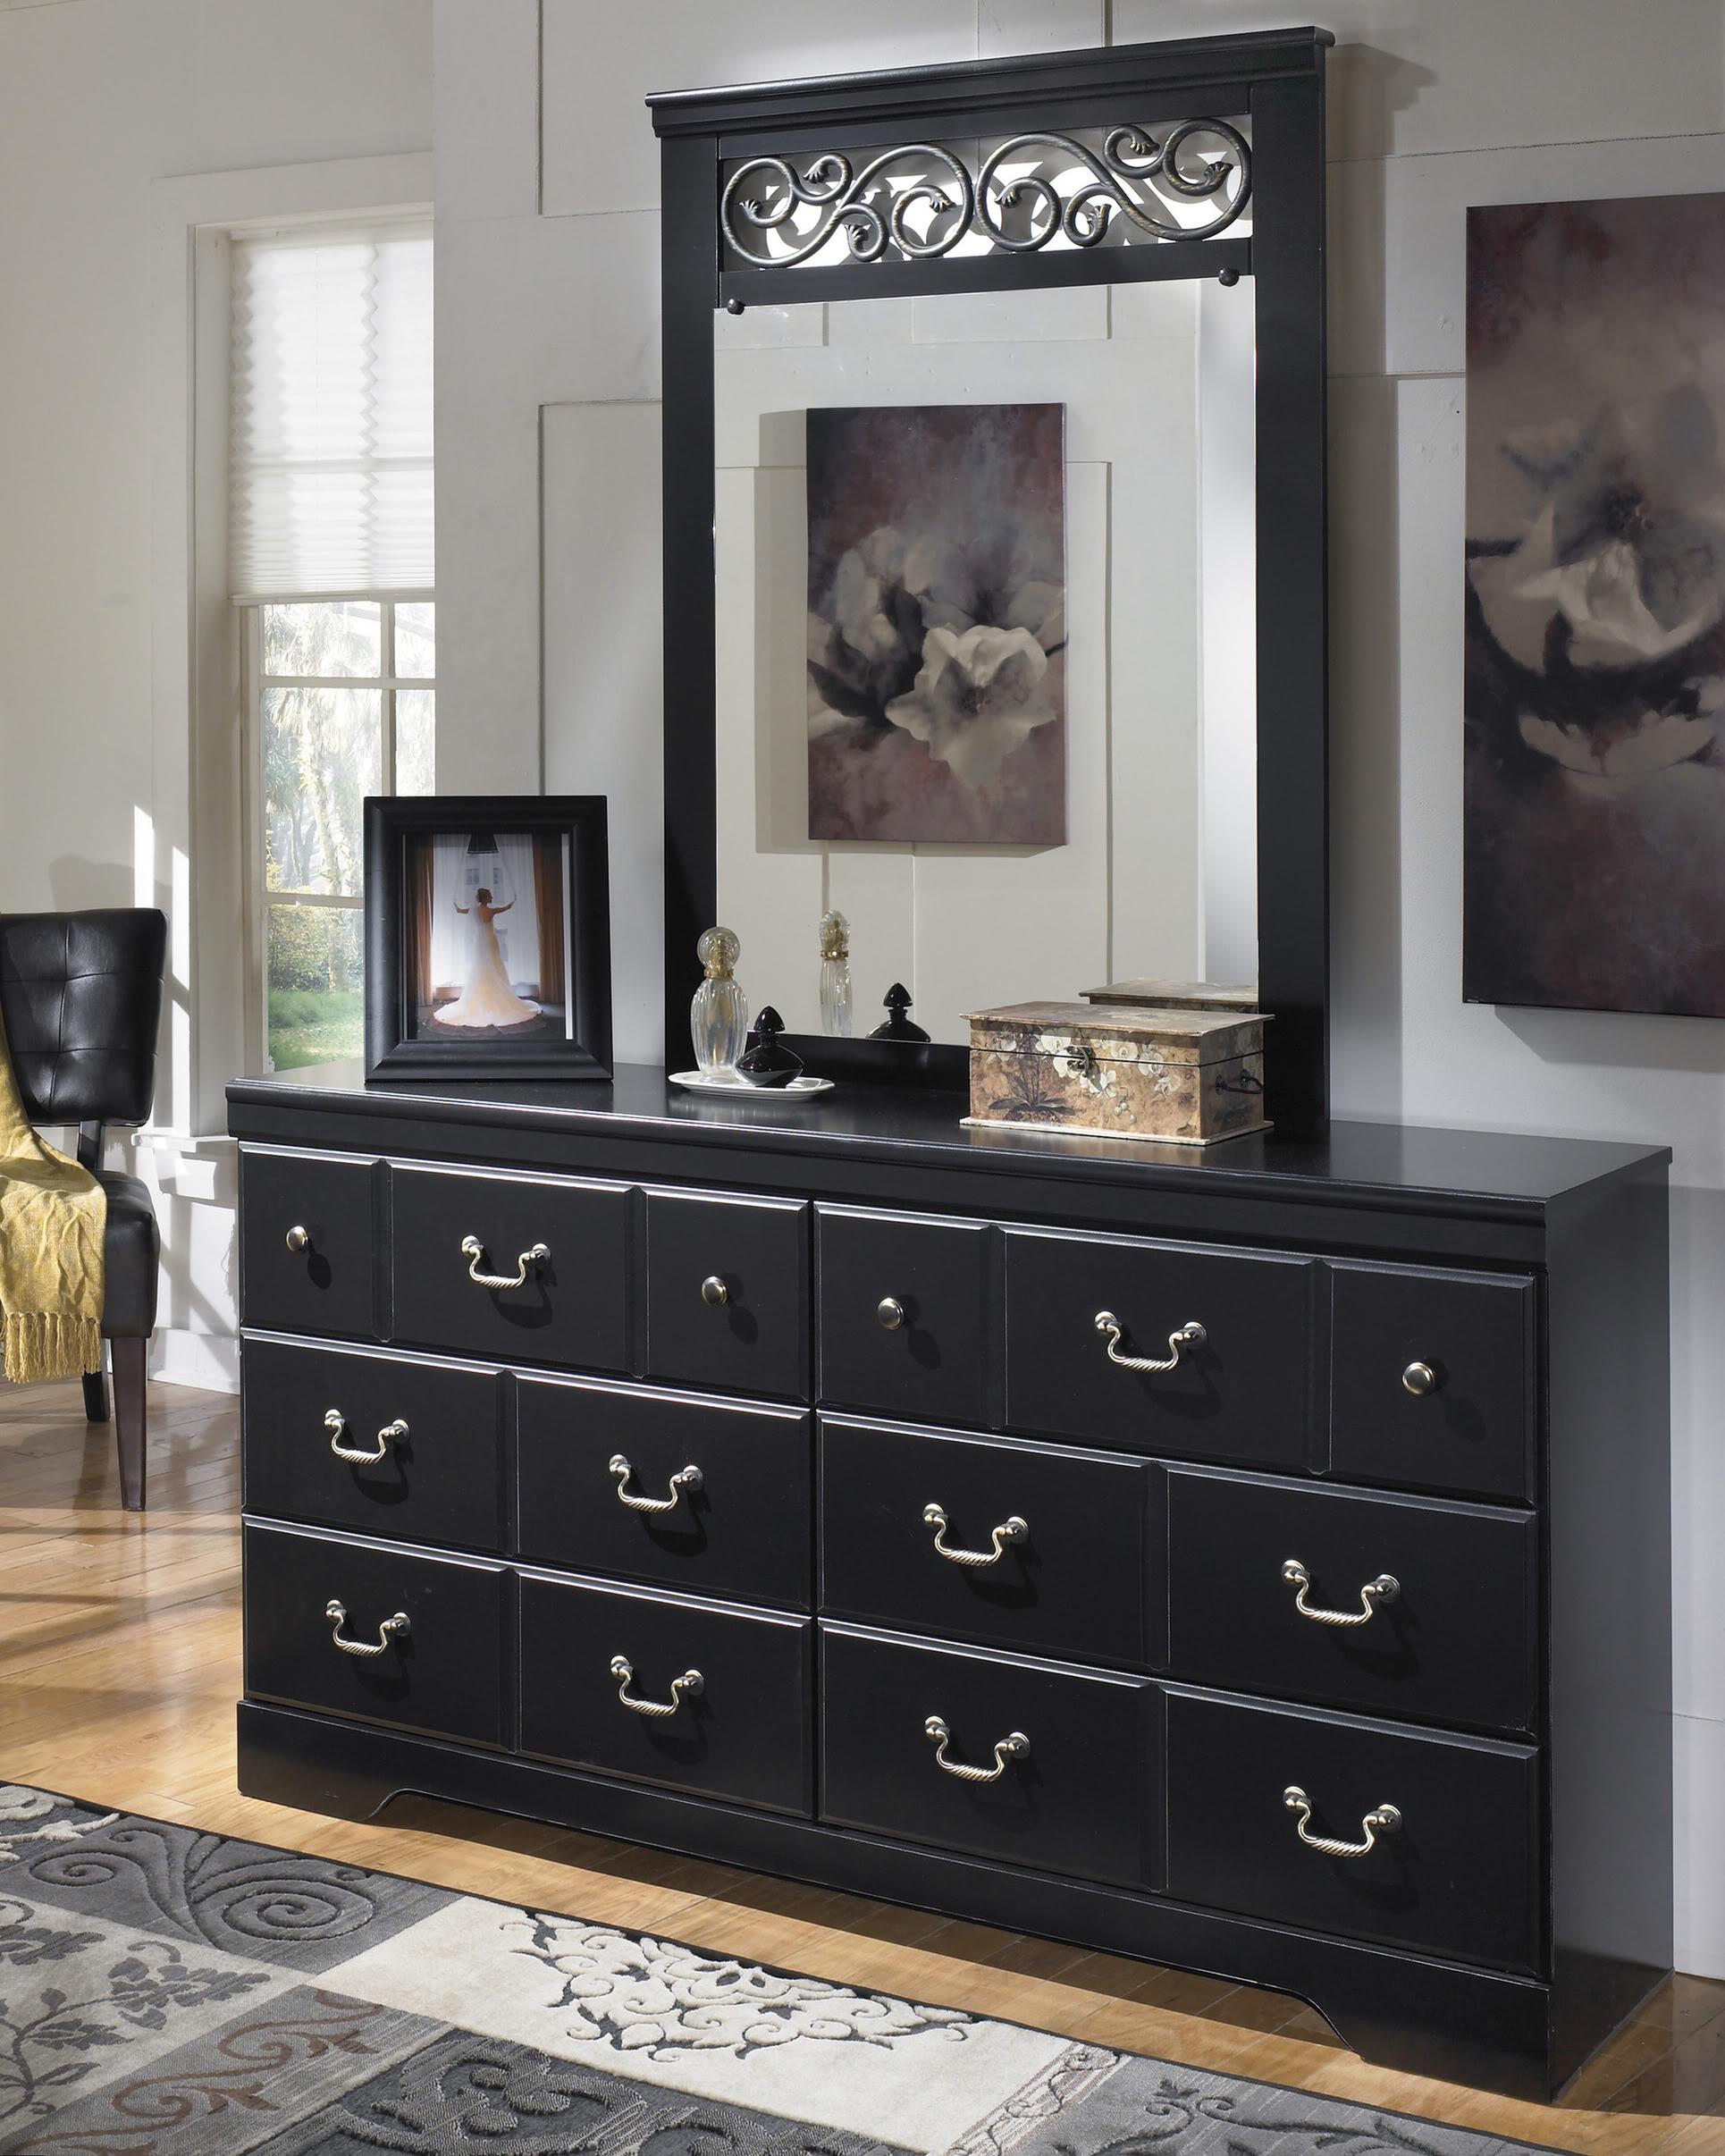 black ornate bedroom furniture photo - 2